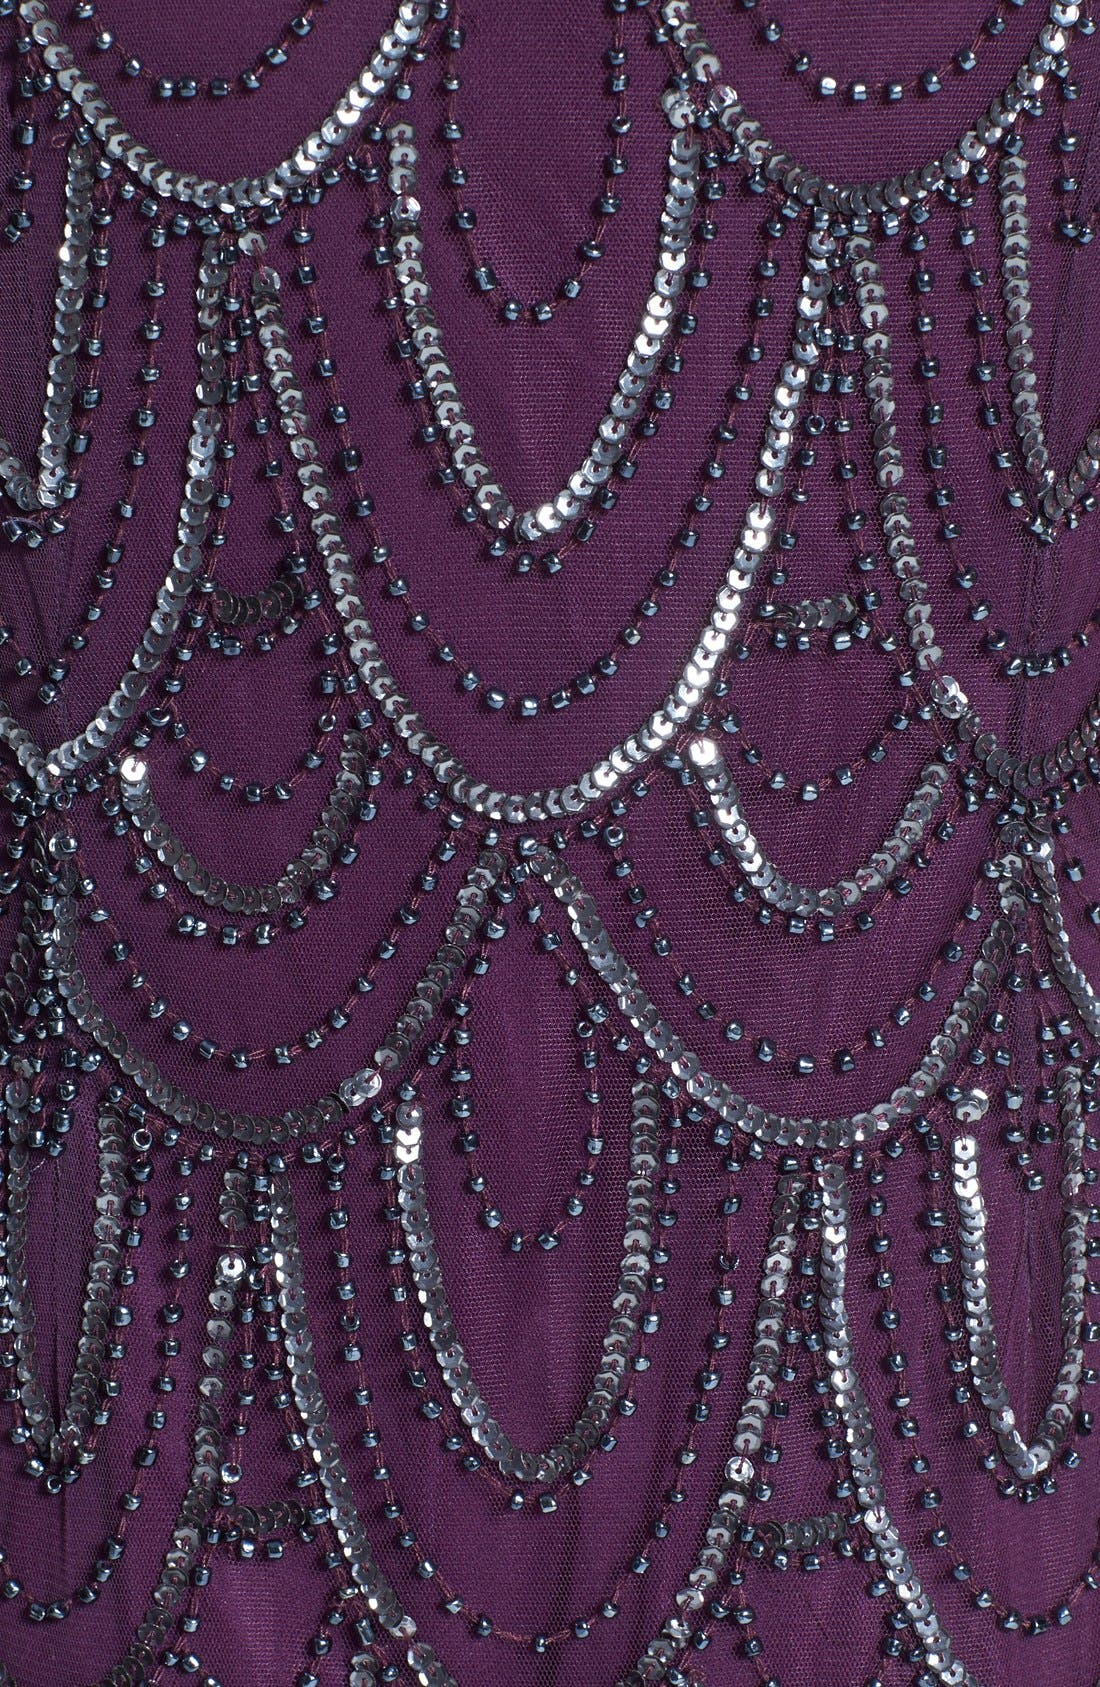 Embellished Mesh Sheath Dress,                             Alternate thumbnail 115, color,